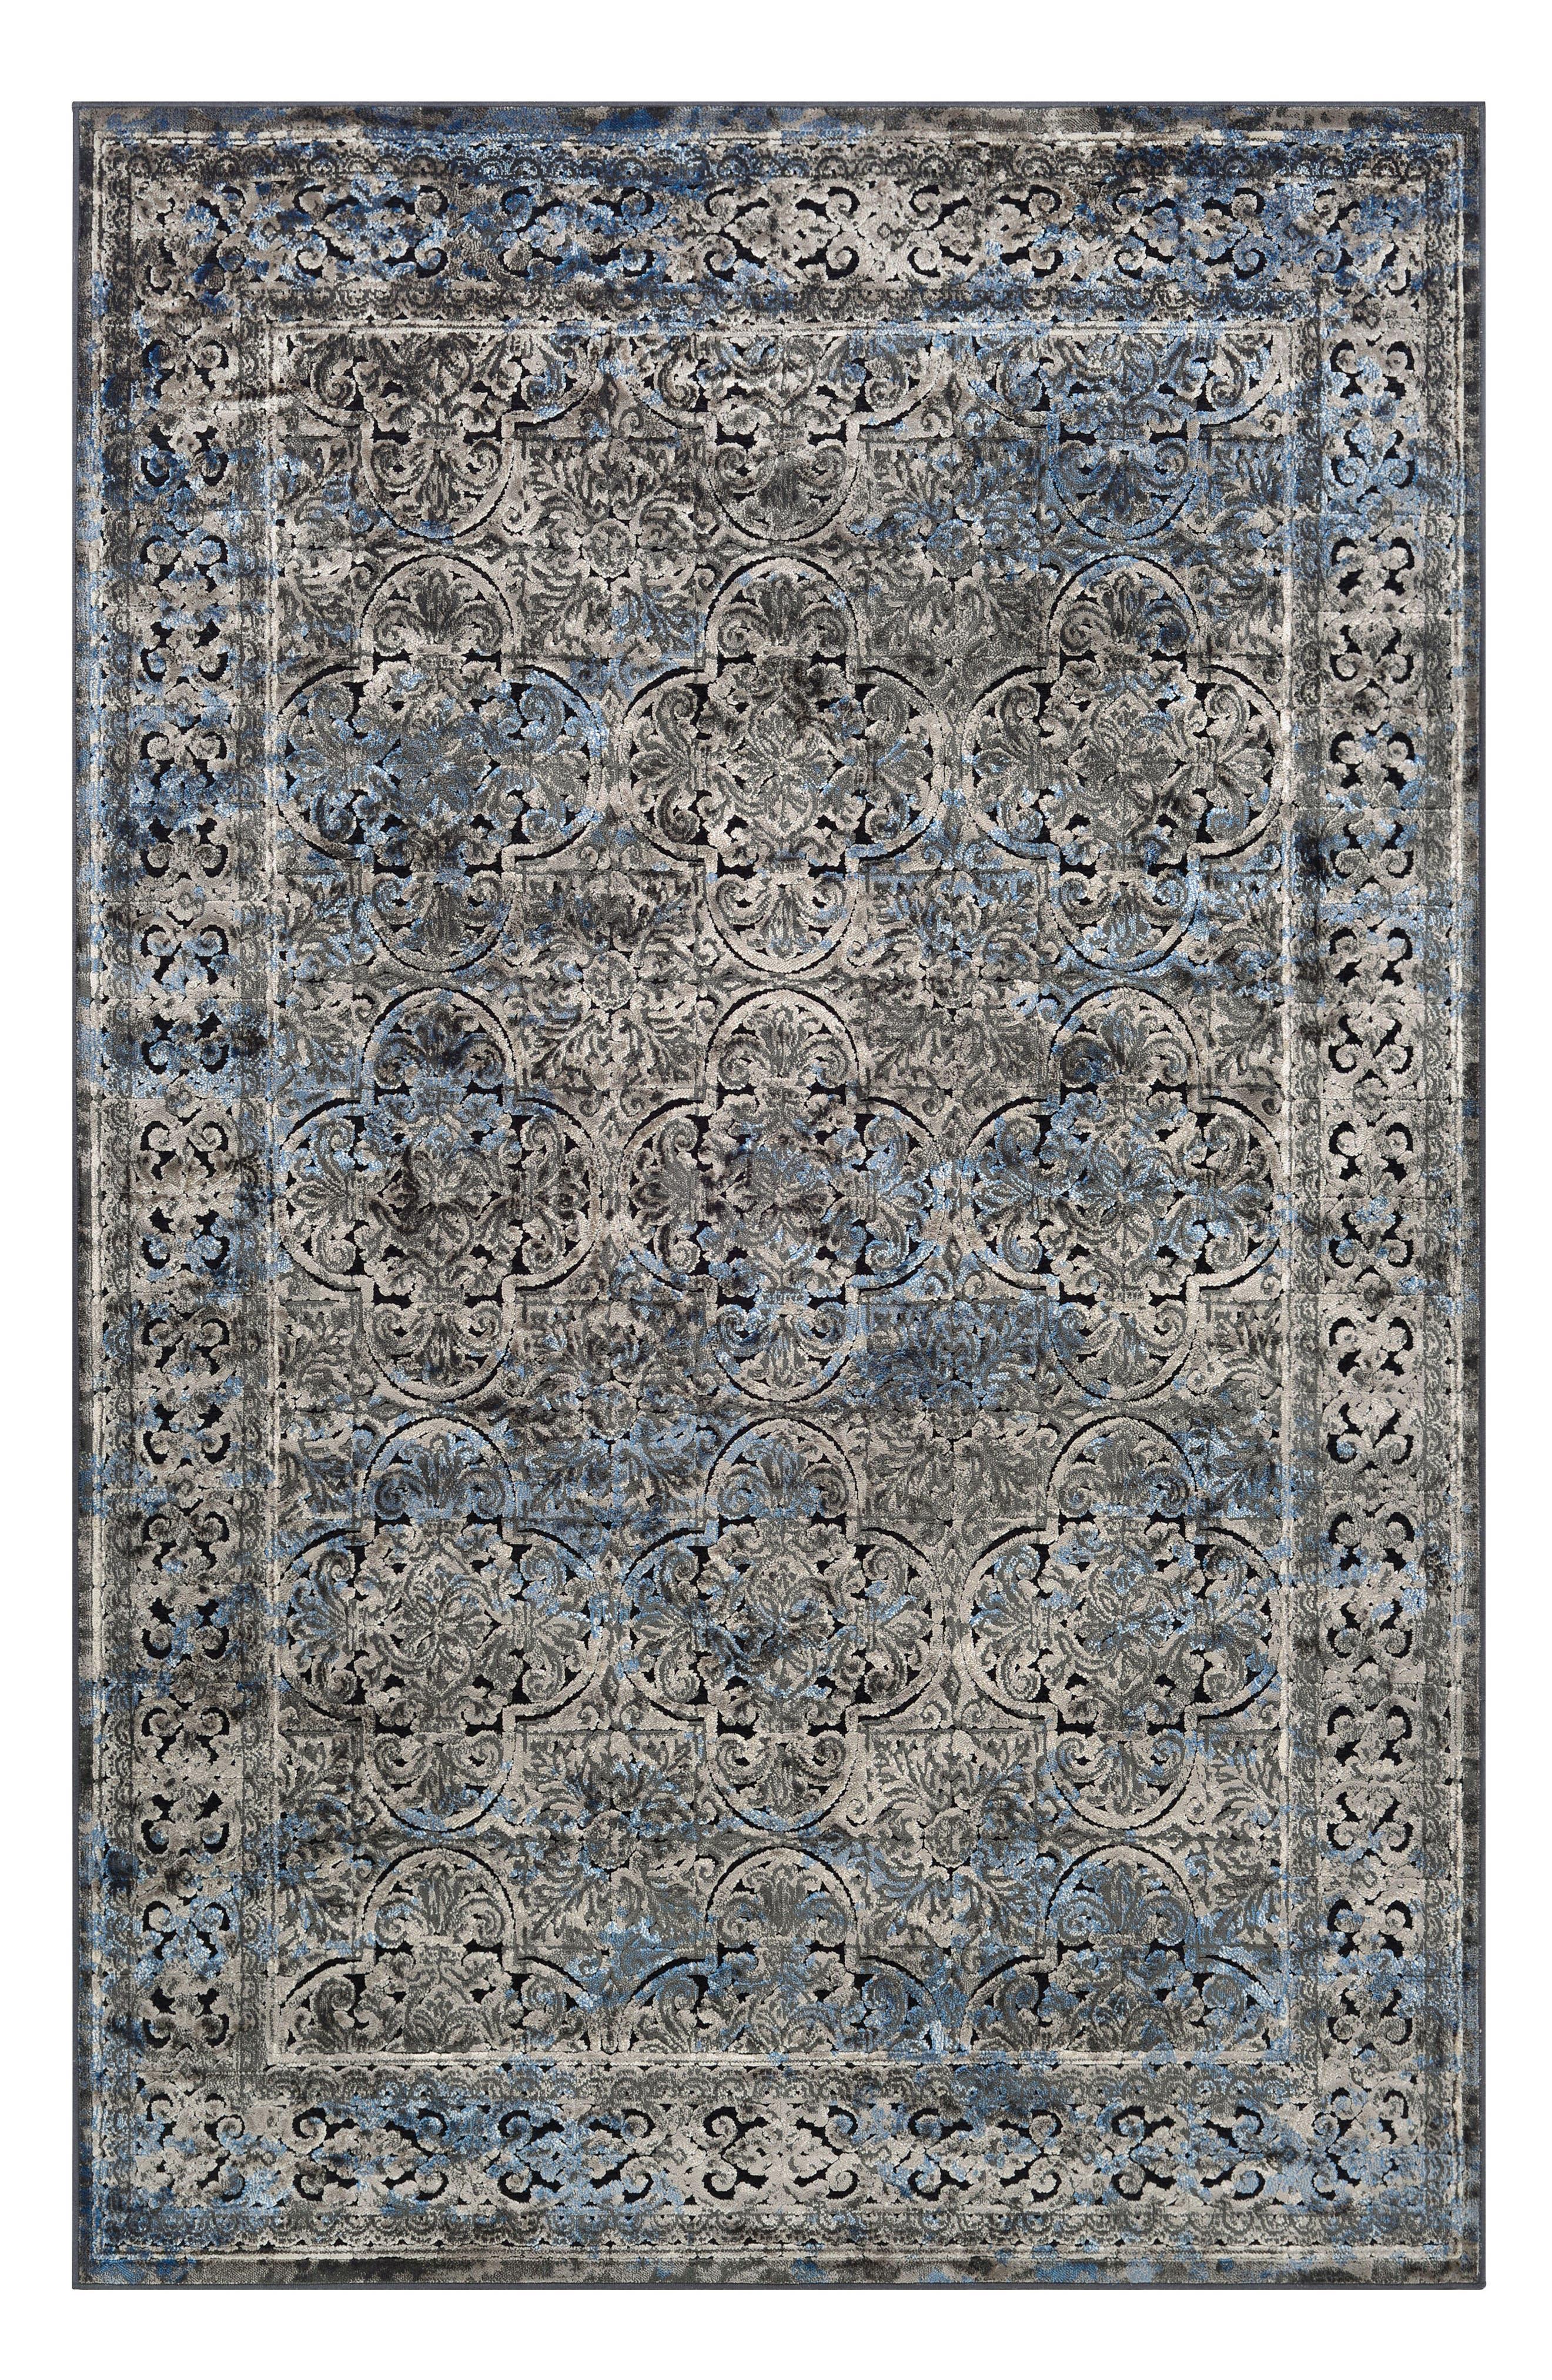 Cire Damsel Area Rug,                         Main,                         color, BLUE/ MULTI